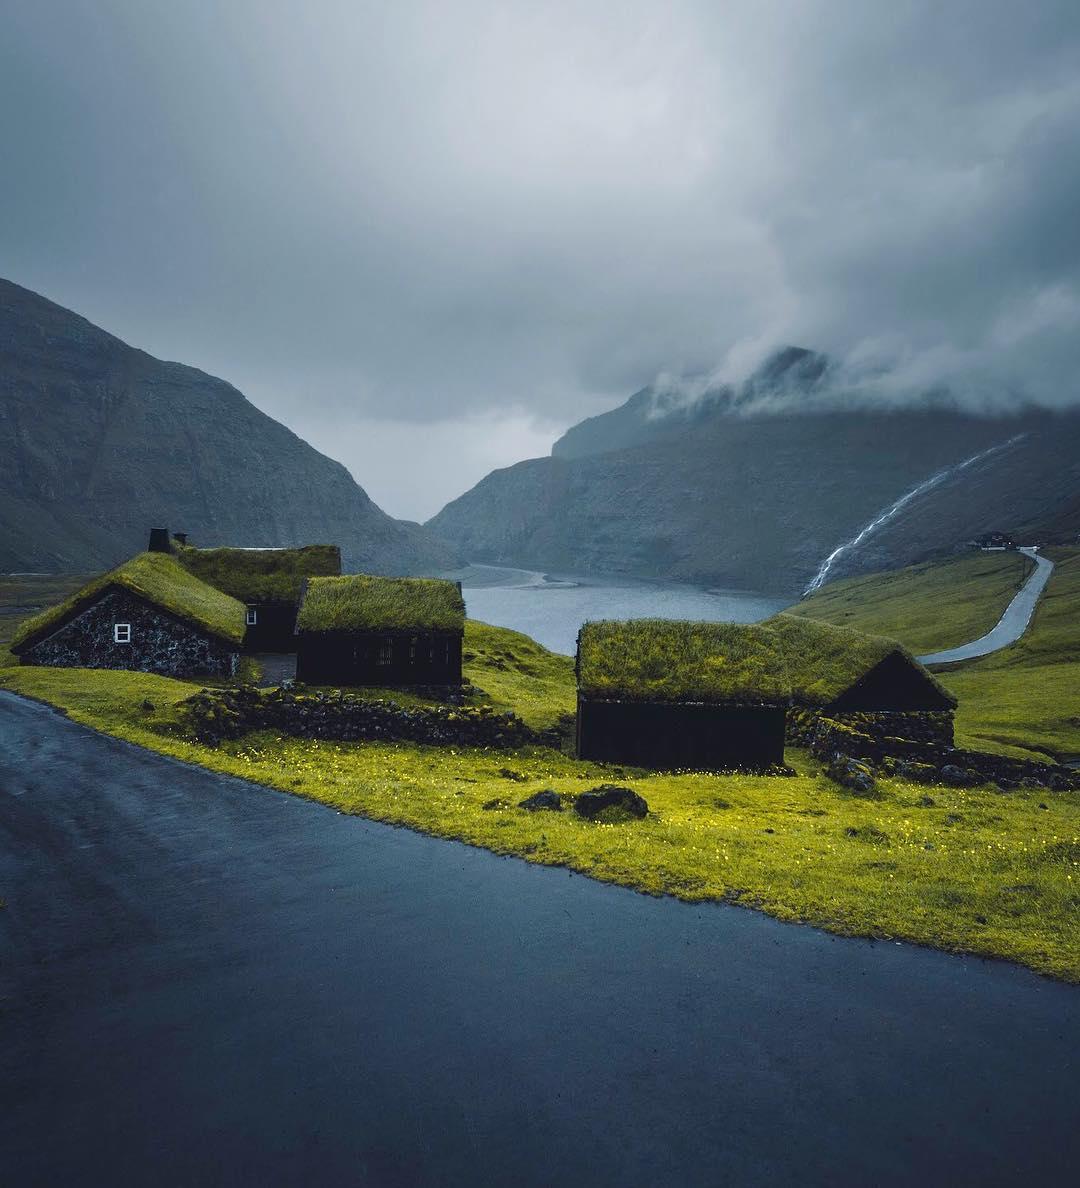 Природа и путешествия на снимках Кума Чевика